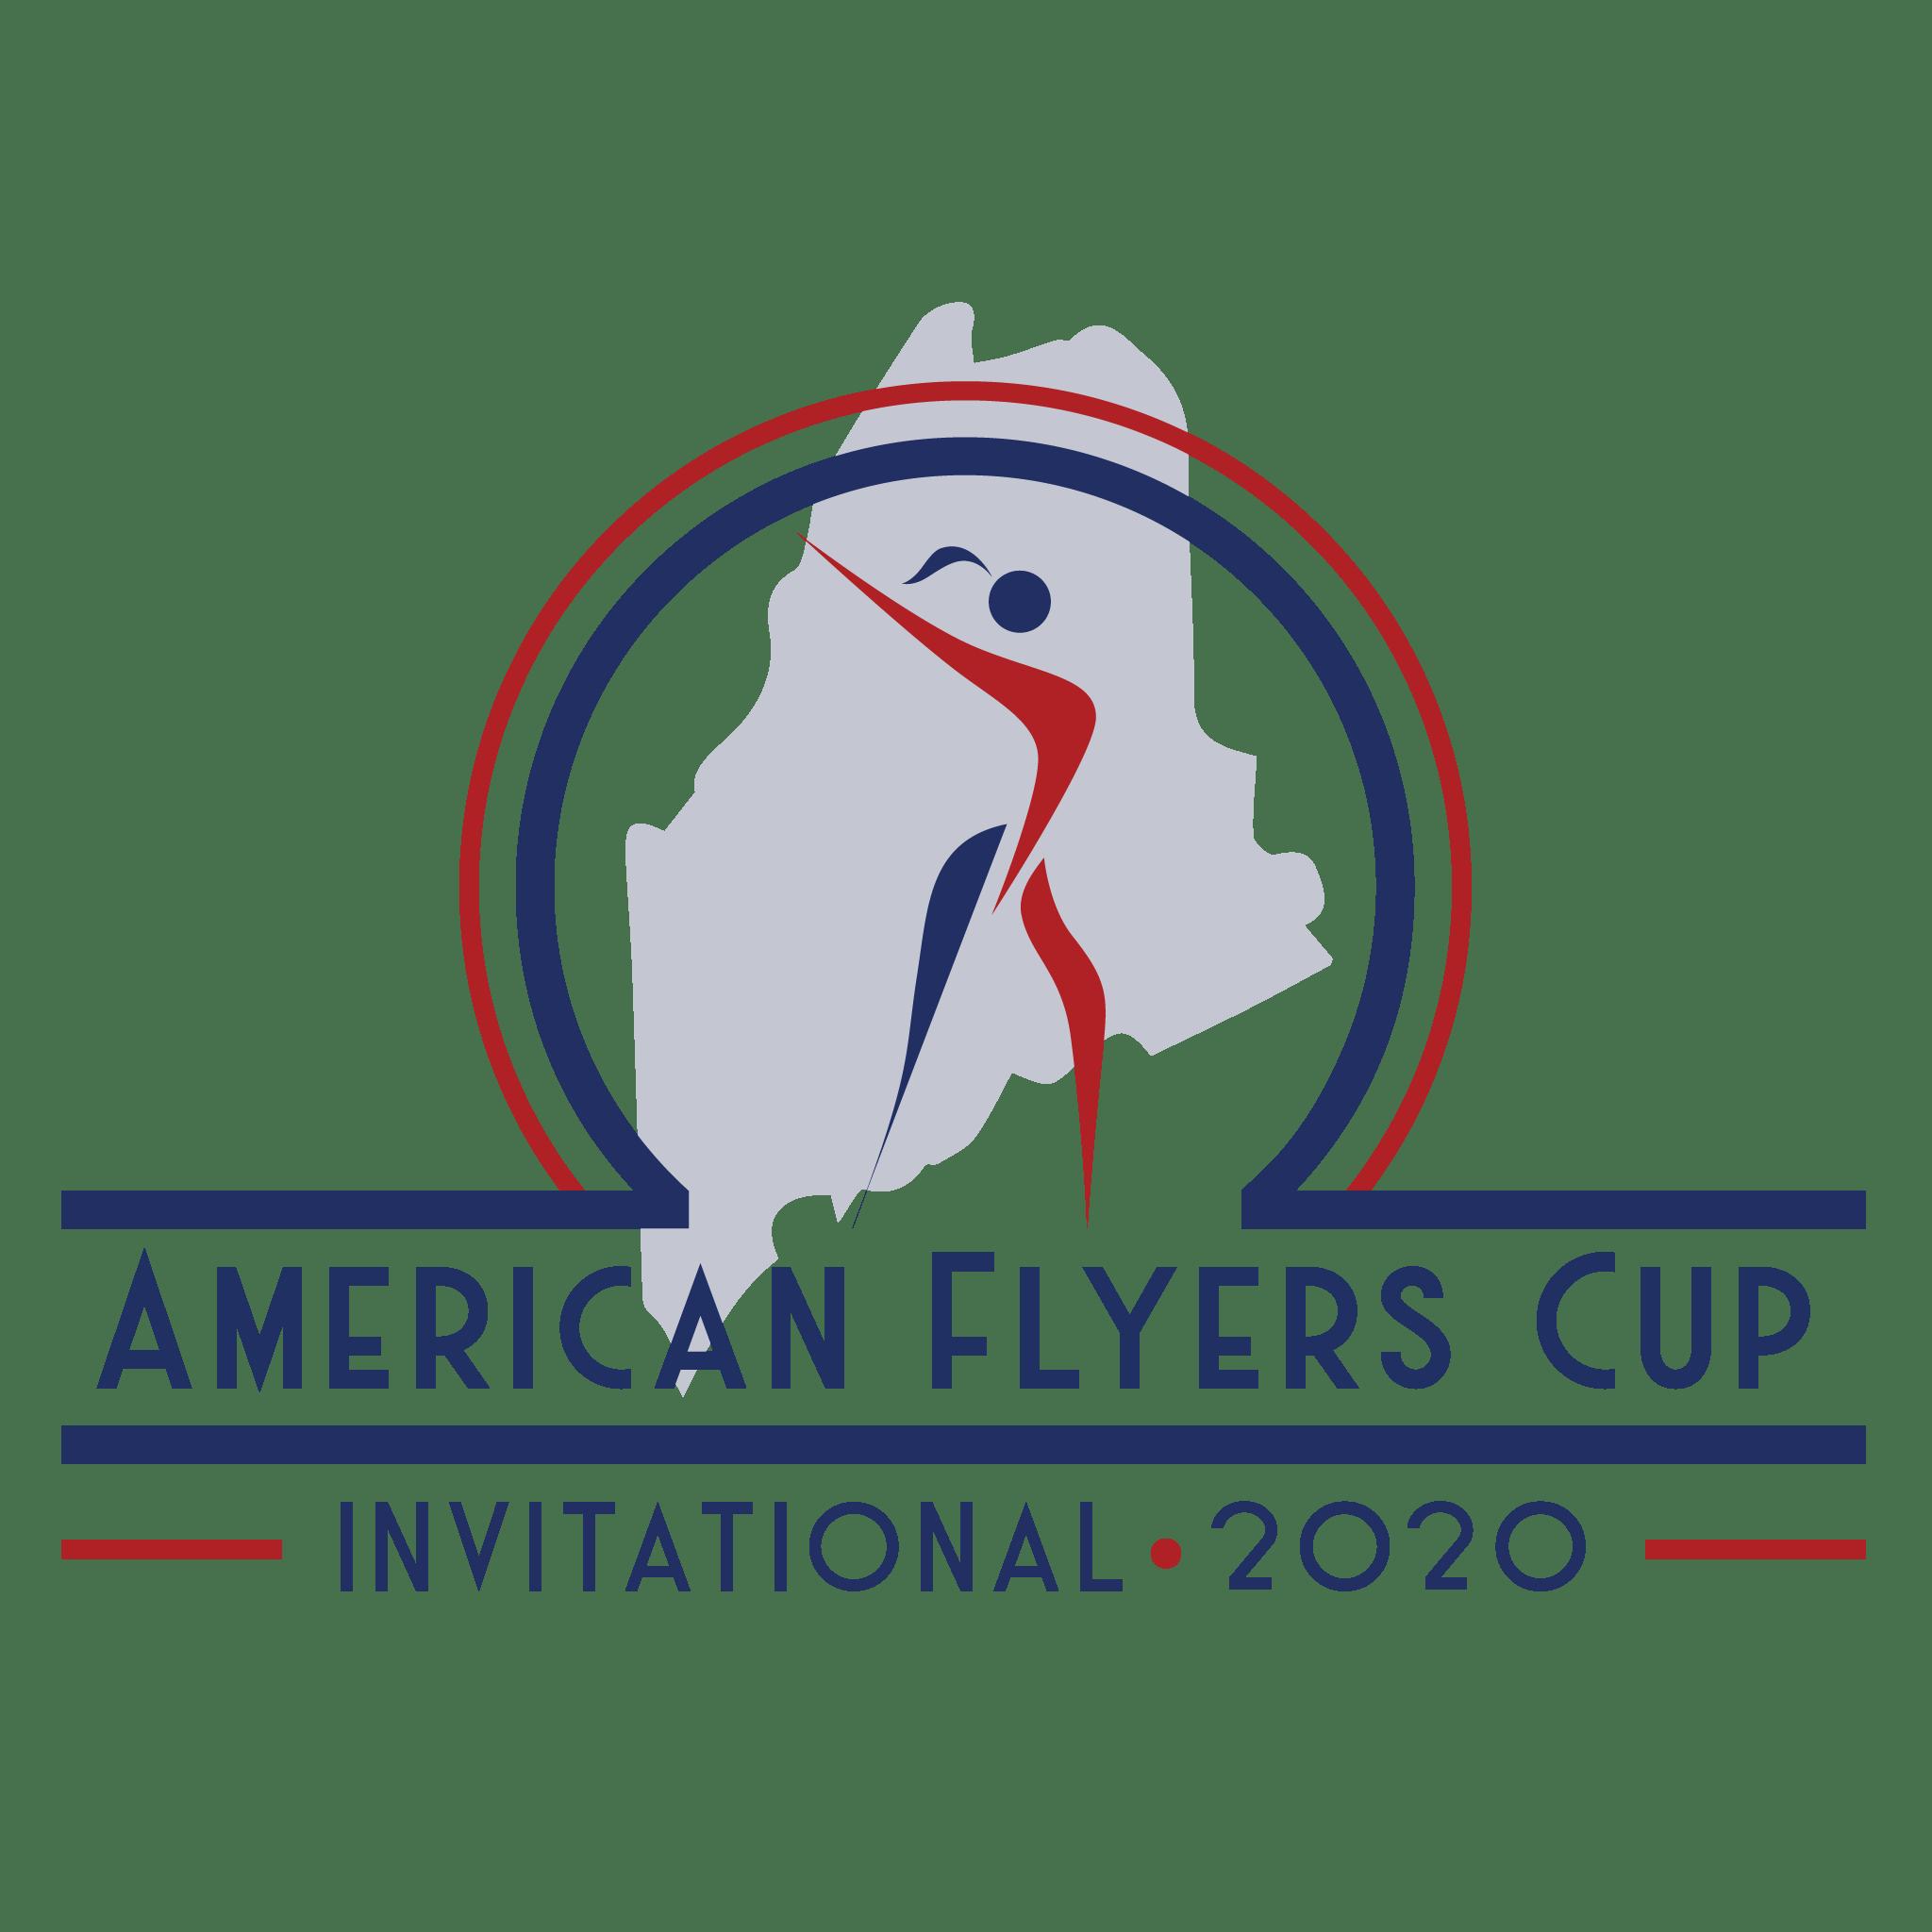 American Flyers Cup 2020 logo